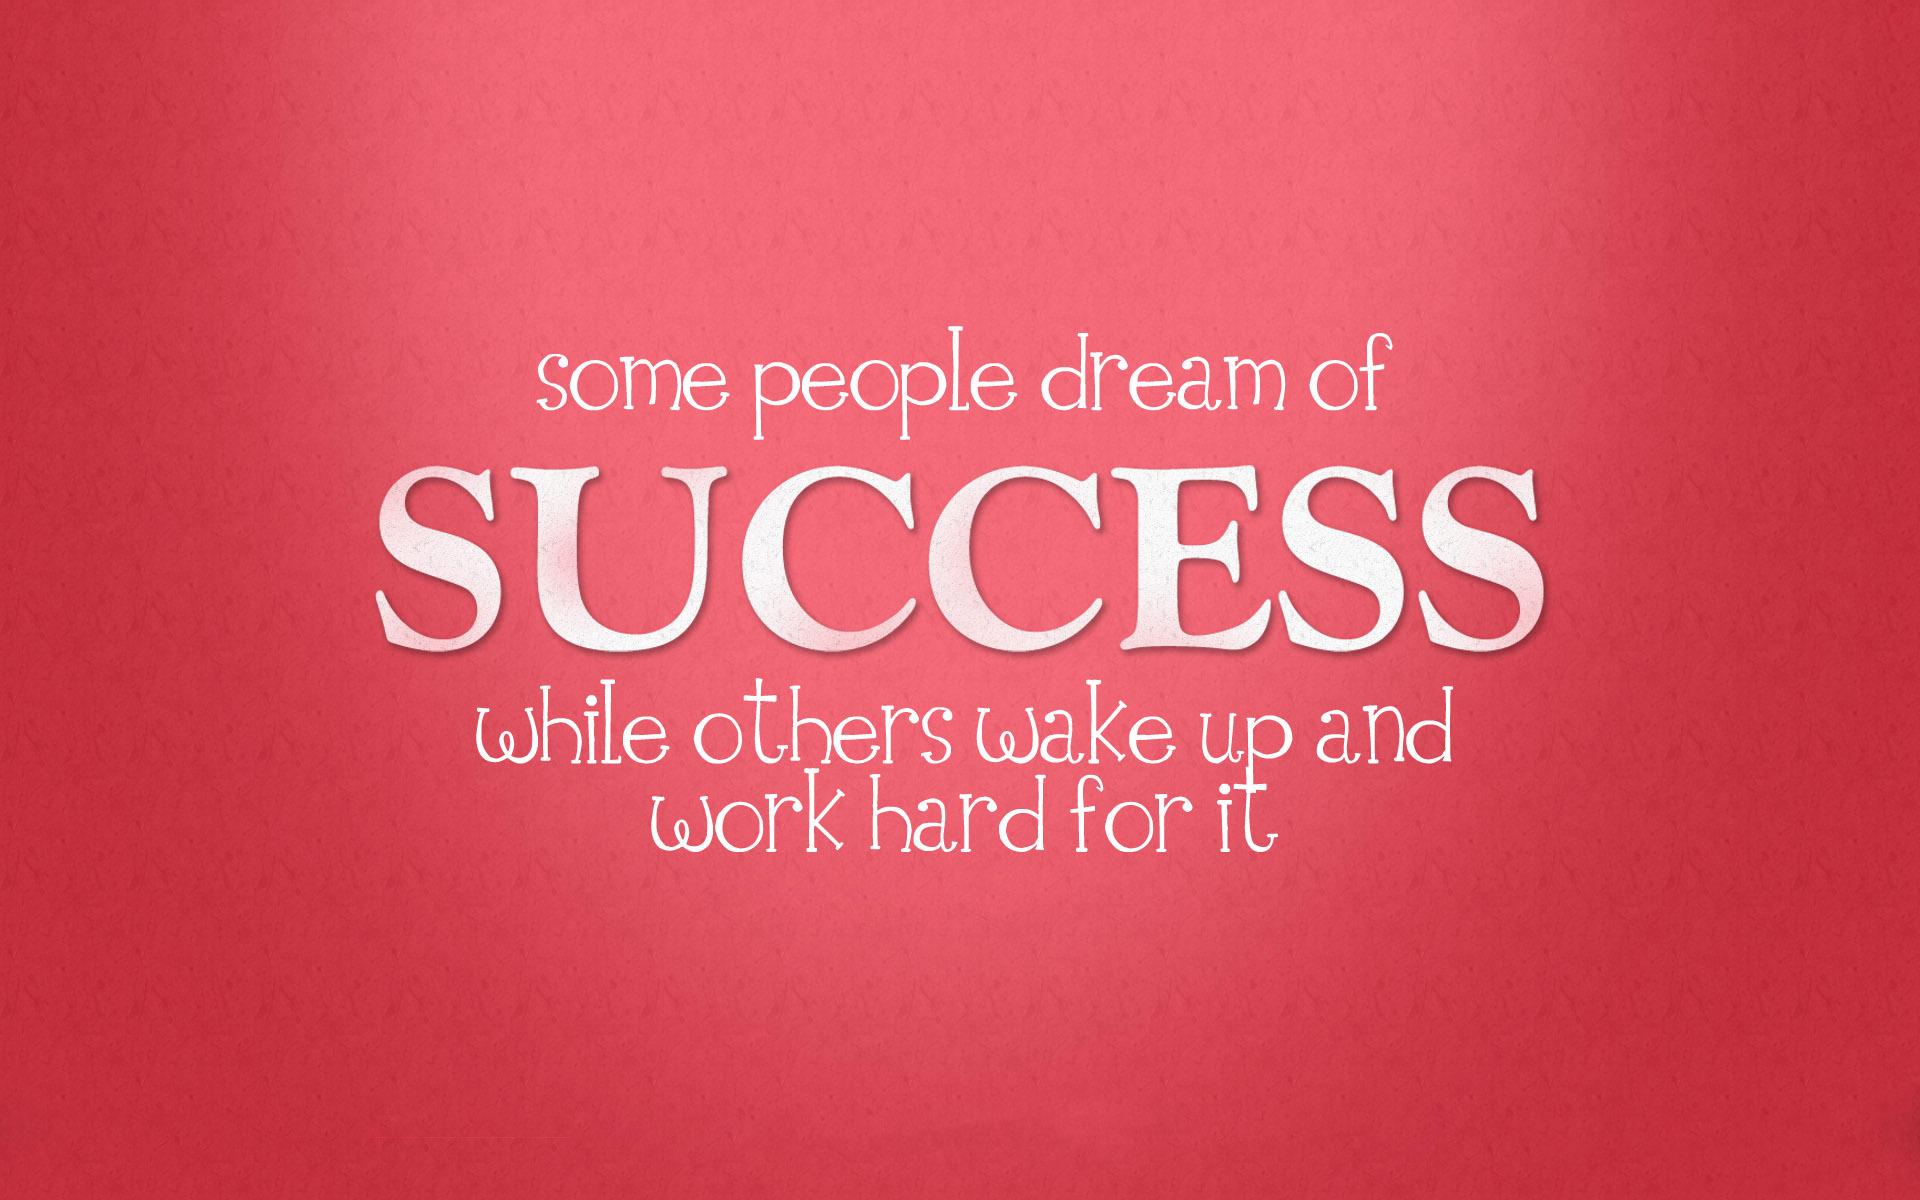 success wallpaper in hindi